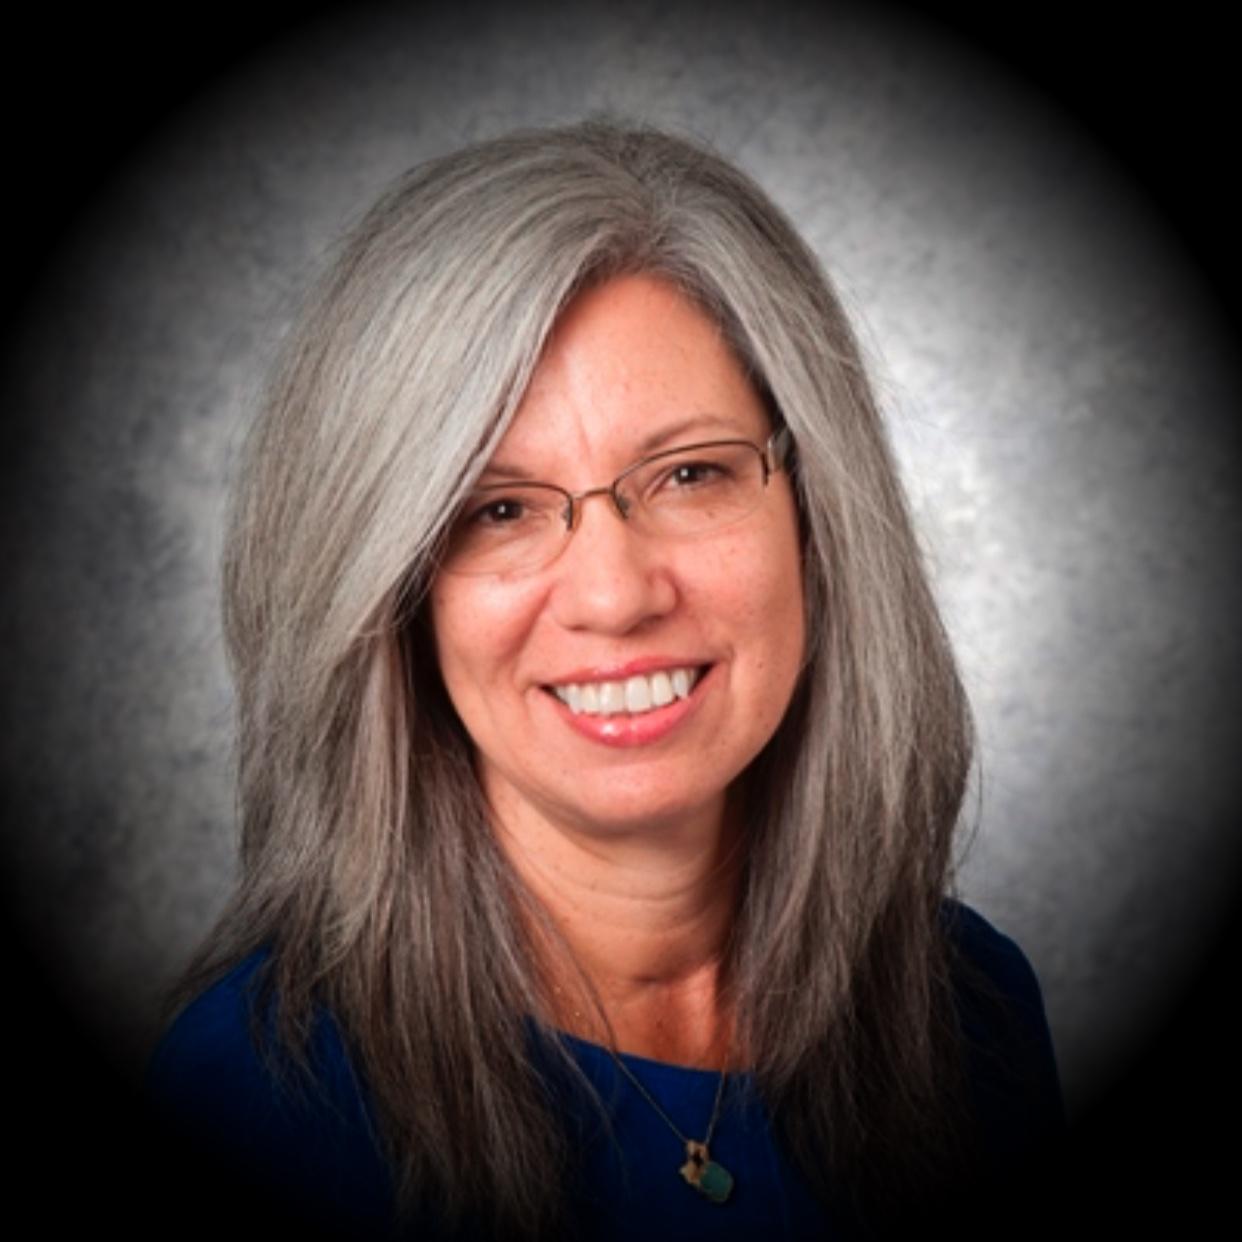 Dra. Isabel Docampo en TeoBytes